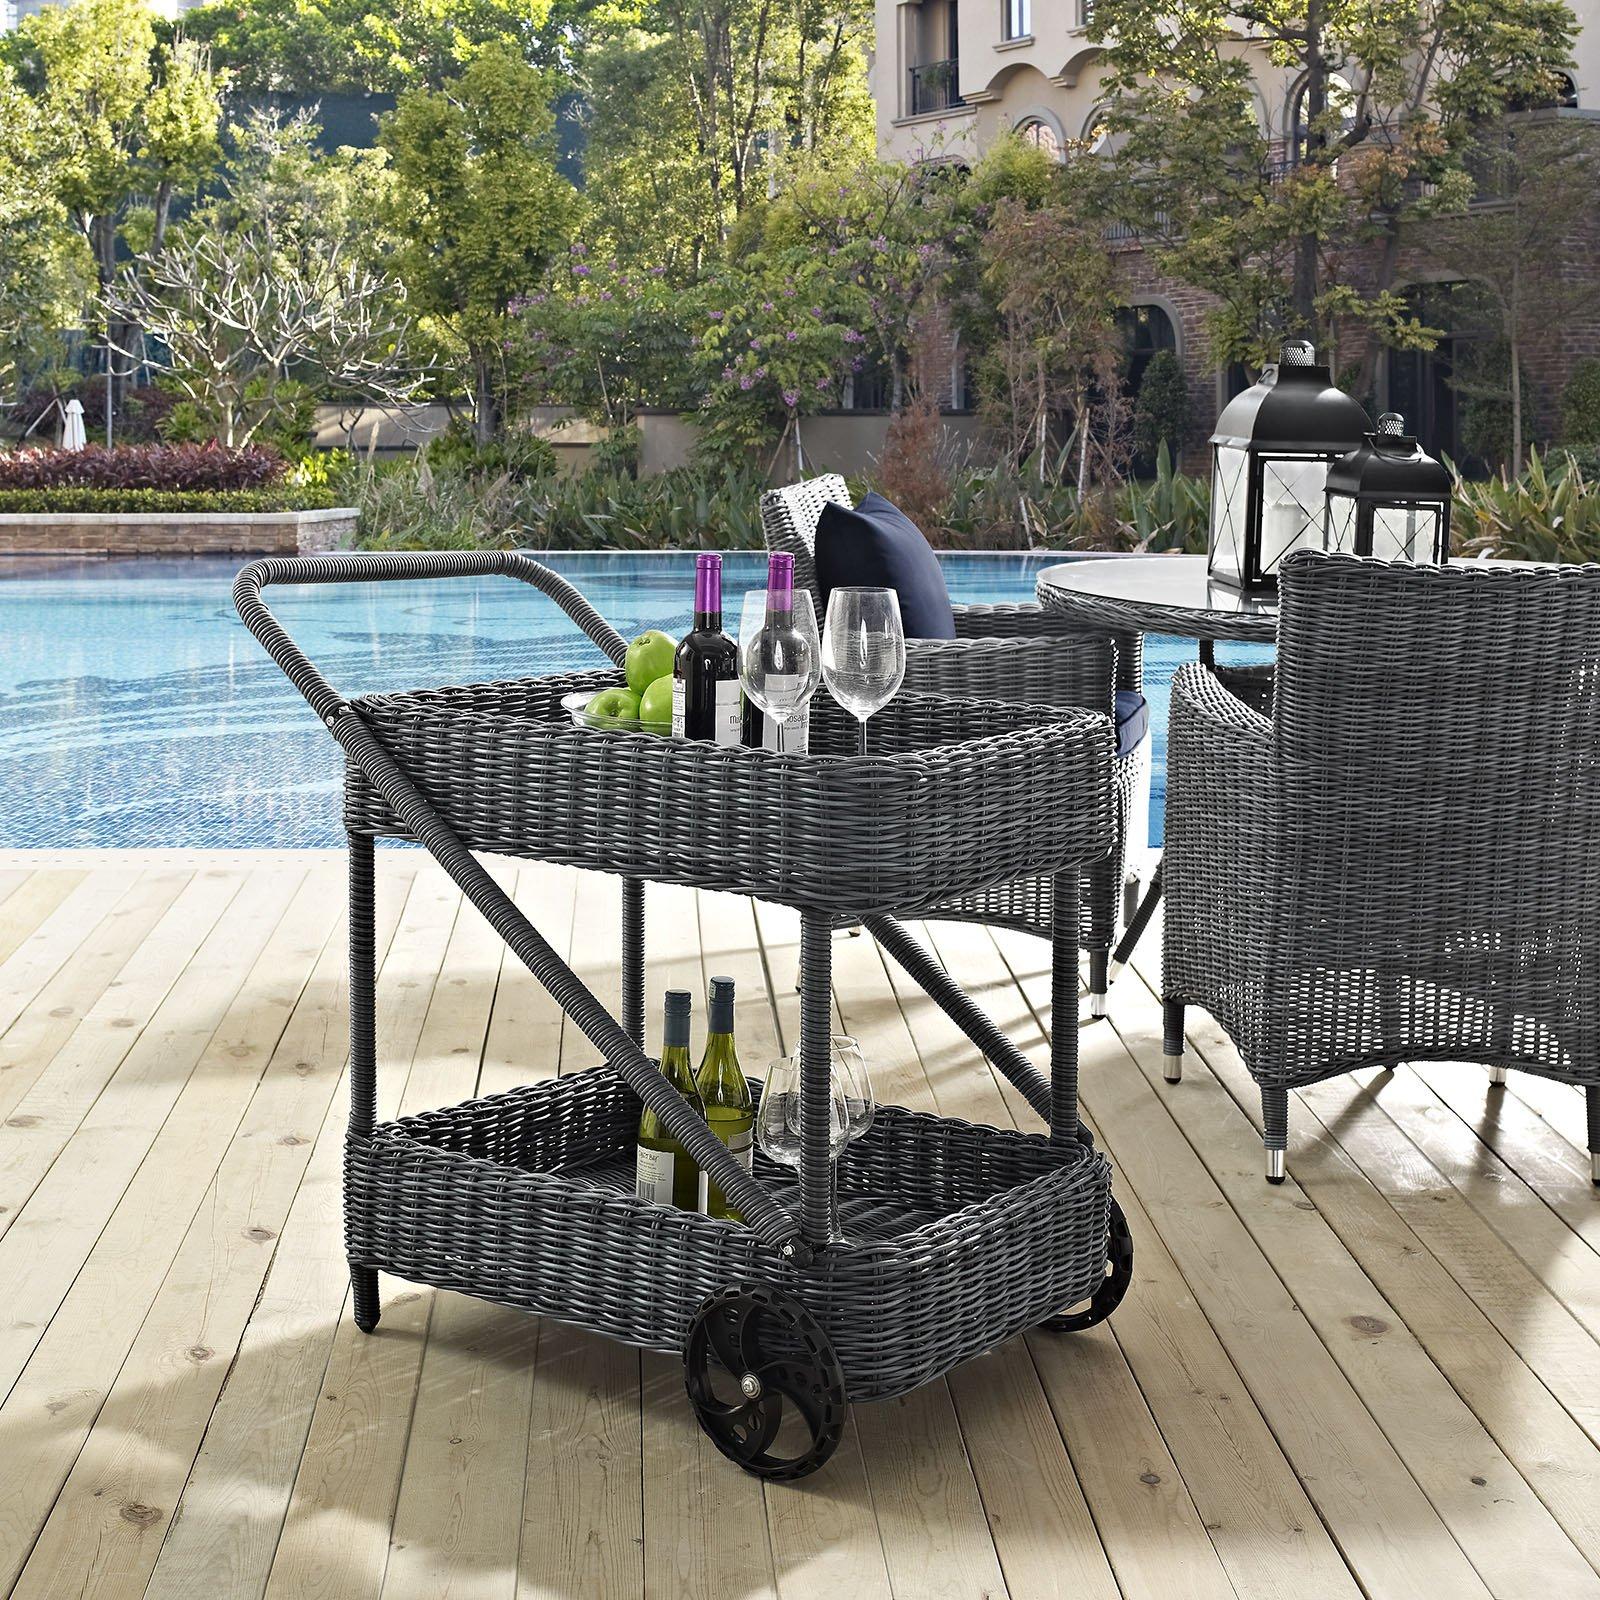 Modway Summon Outdoor Patio Rattan Weave Beverage Cart in Gray